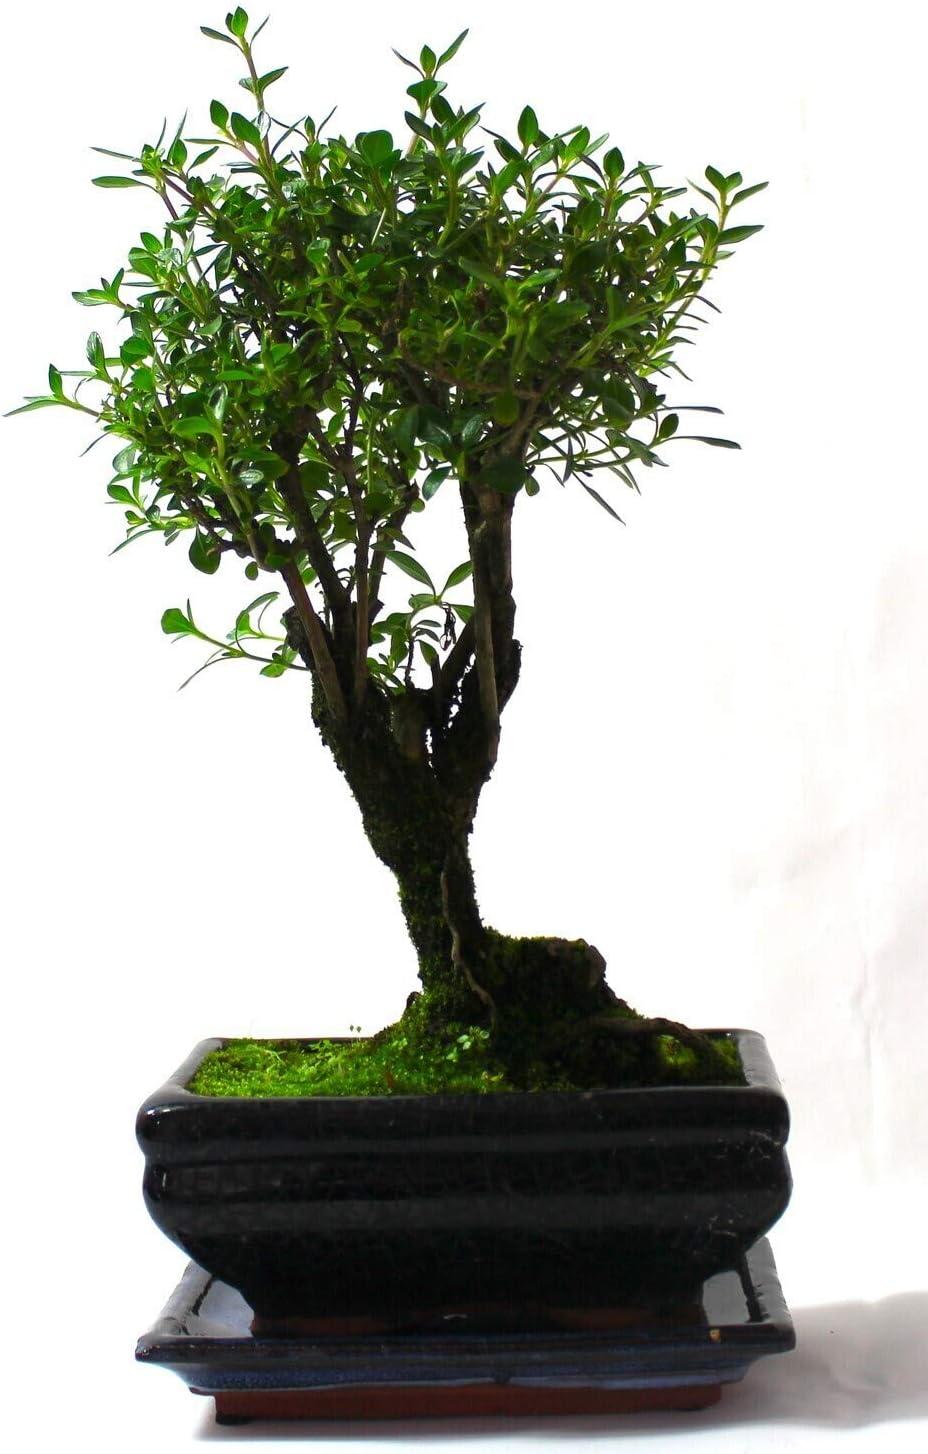 Supplied with Ceramic drip Tray Serrissa Flowering Bonsai Tree